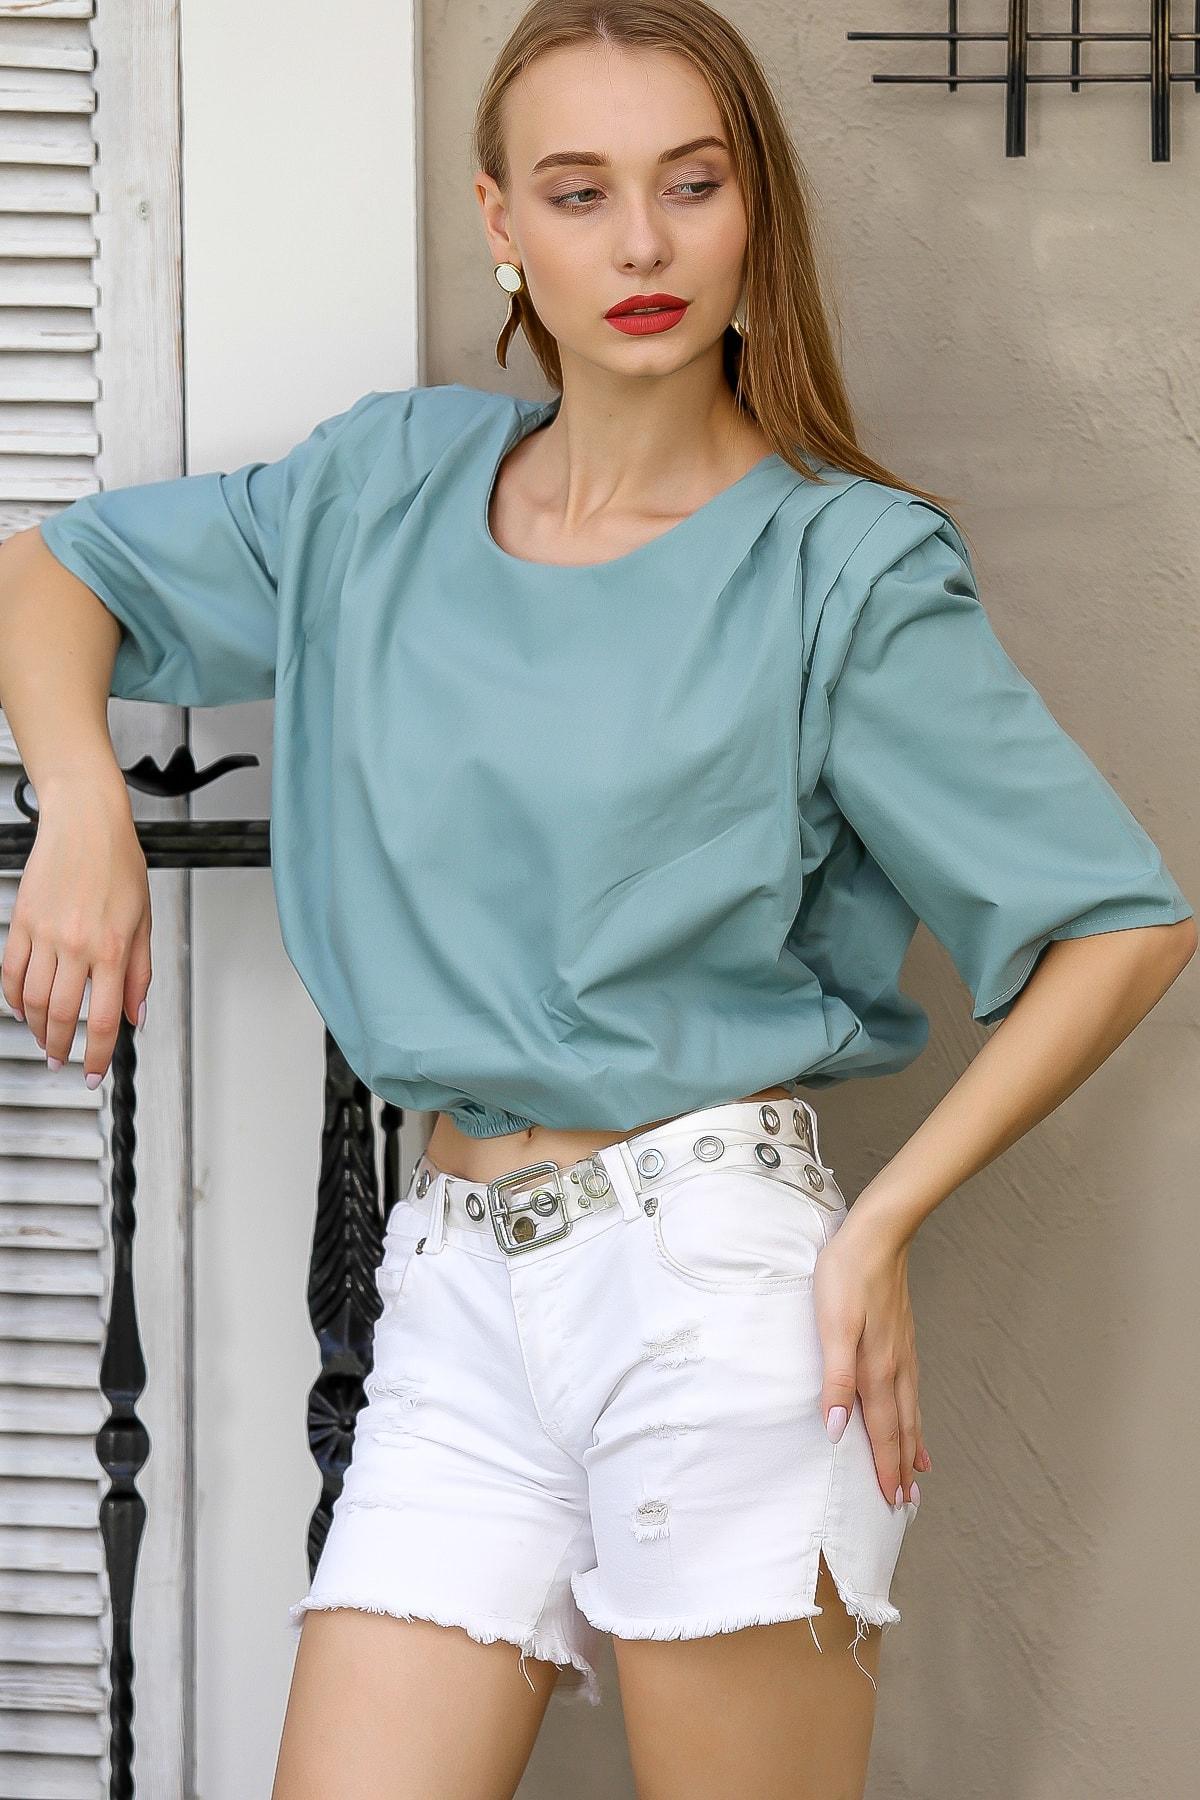 Chiccy Kadın Nil Yeşili Retro Omuzları Pileli Vatka Detaylı Beli Lastikli Bluz M10010200Bl96087